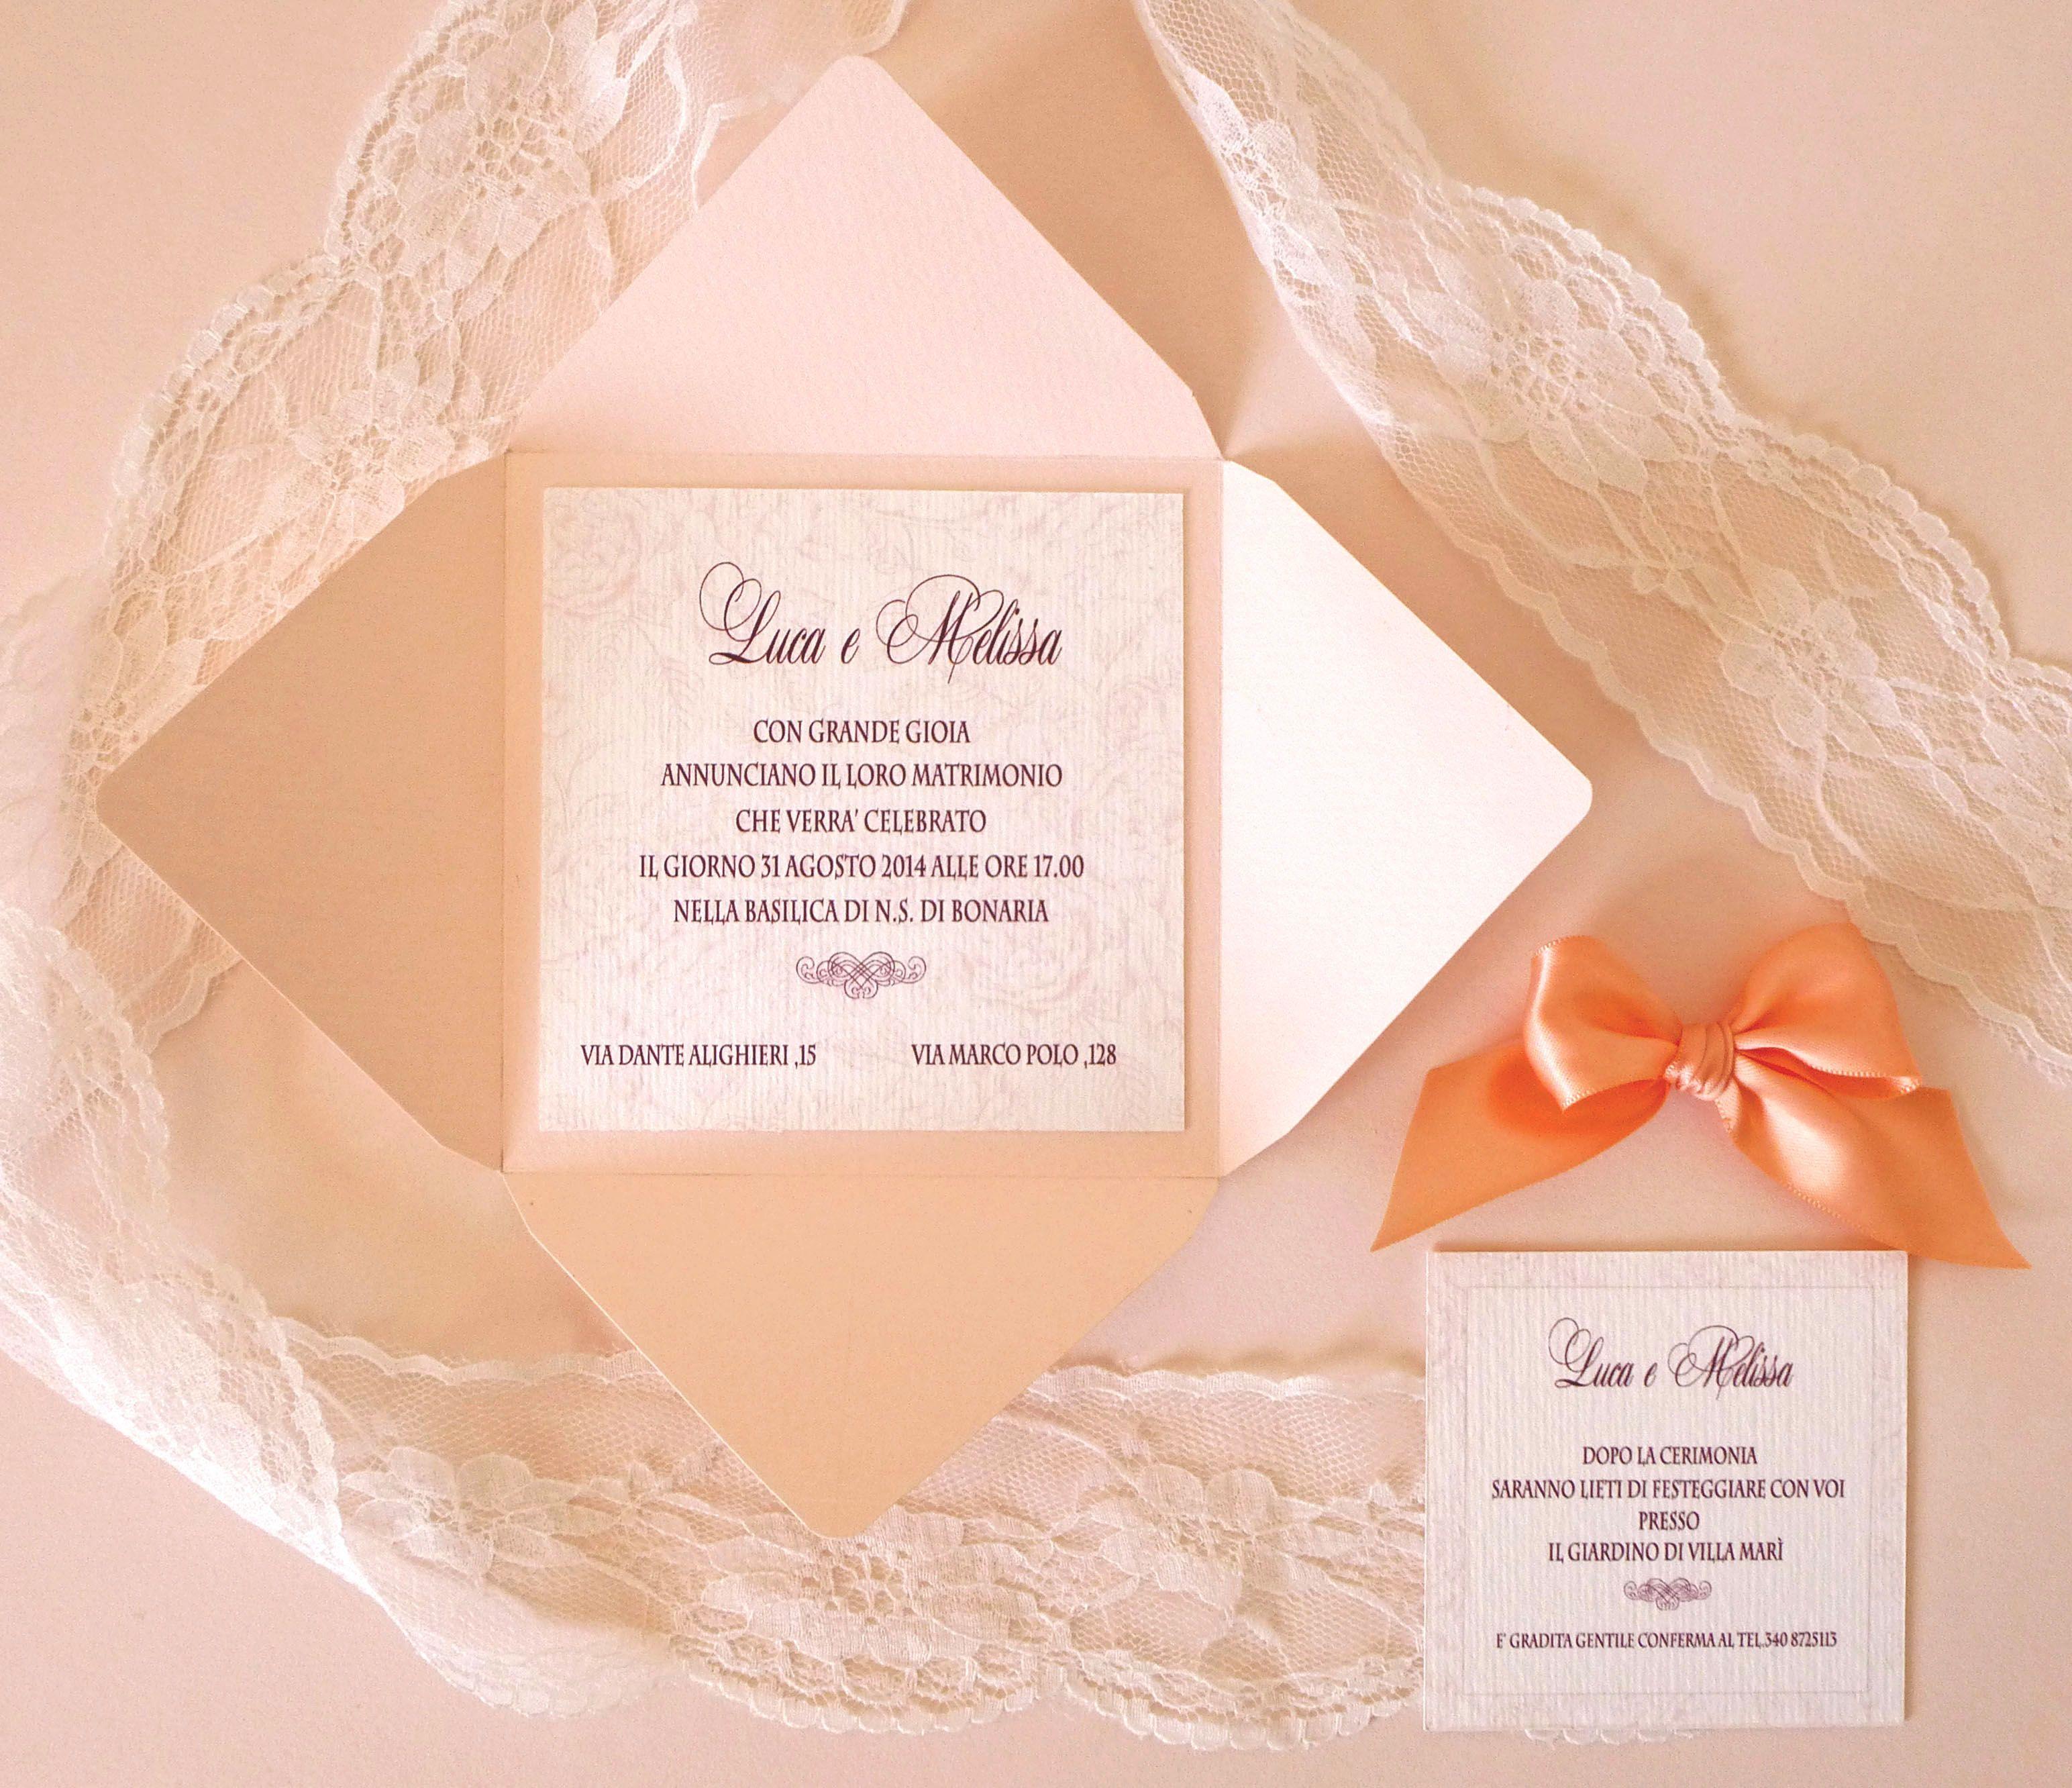 WEDDING INVITATIONS HANDMADE BY LOVE PAPER WEDDING